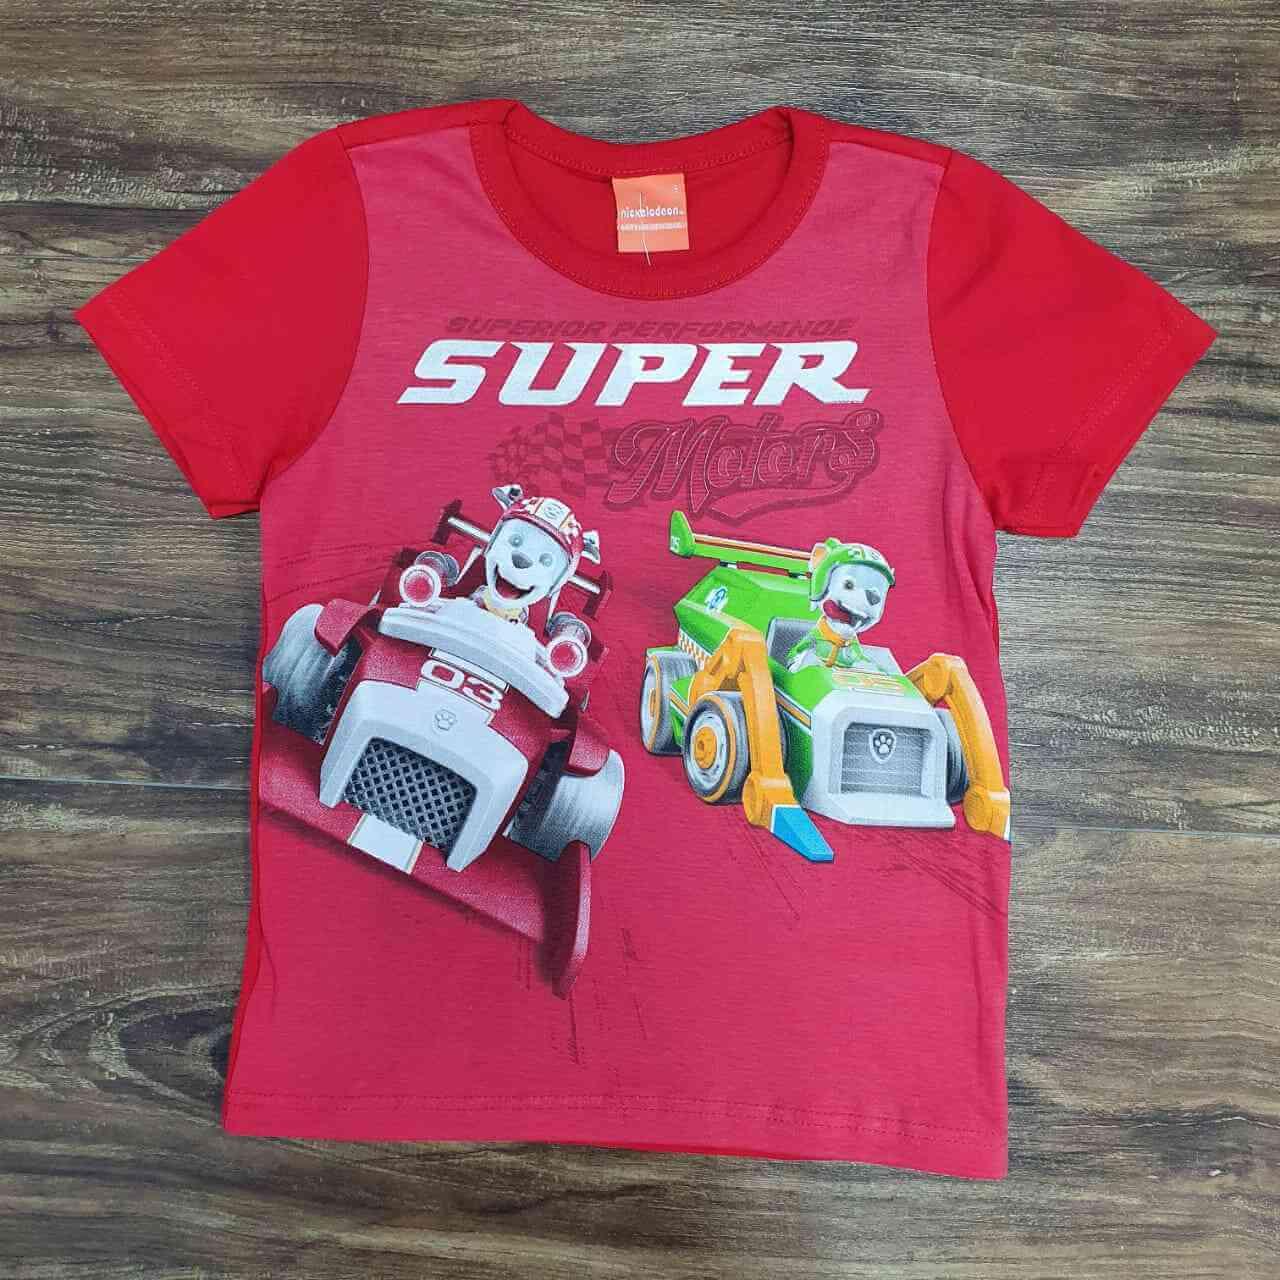 Camiseta Vermelha Super Patrulha Canina Infantil